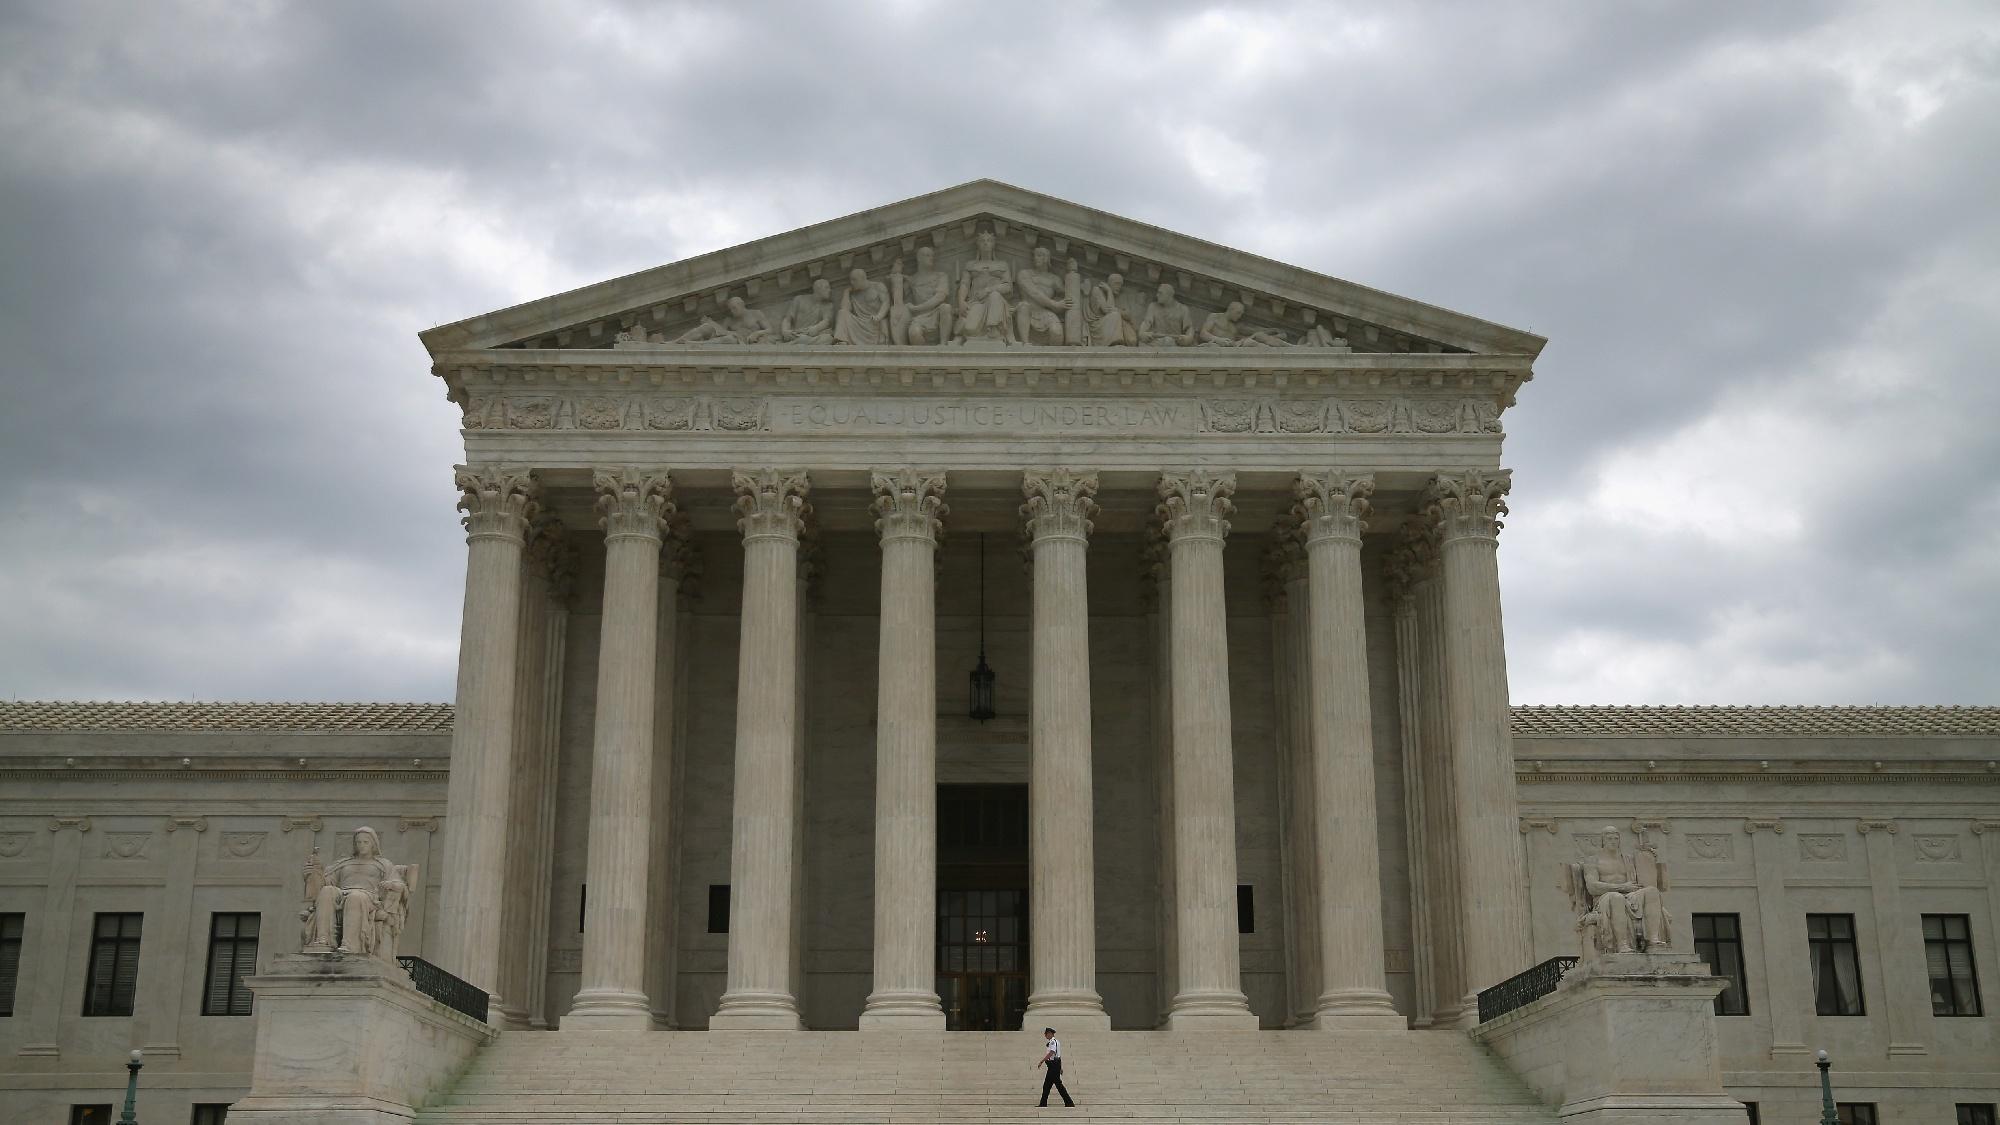 Supreme-Court-jpg_92653_ver1_20170126020002-159532